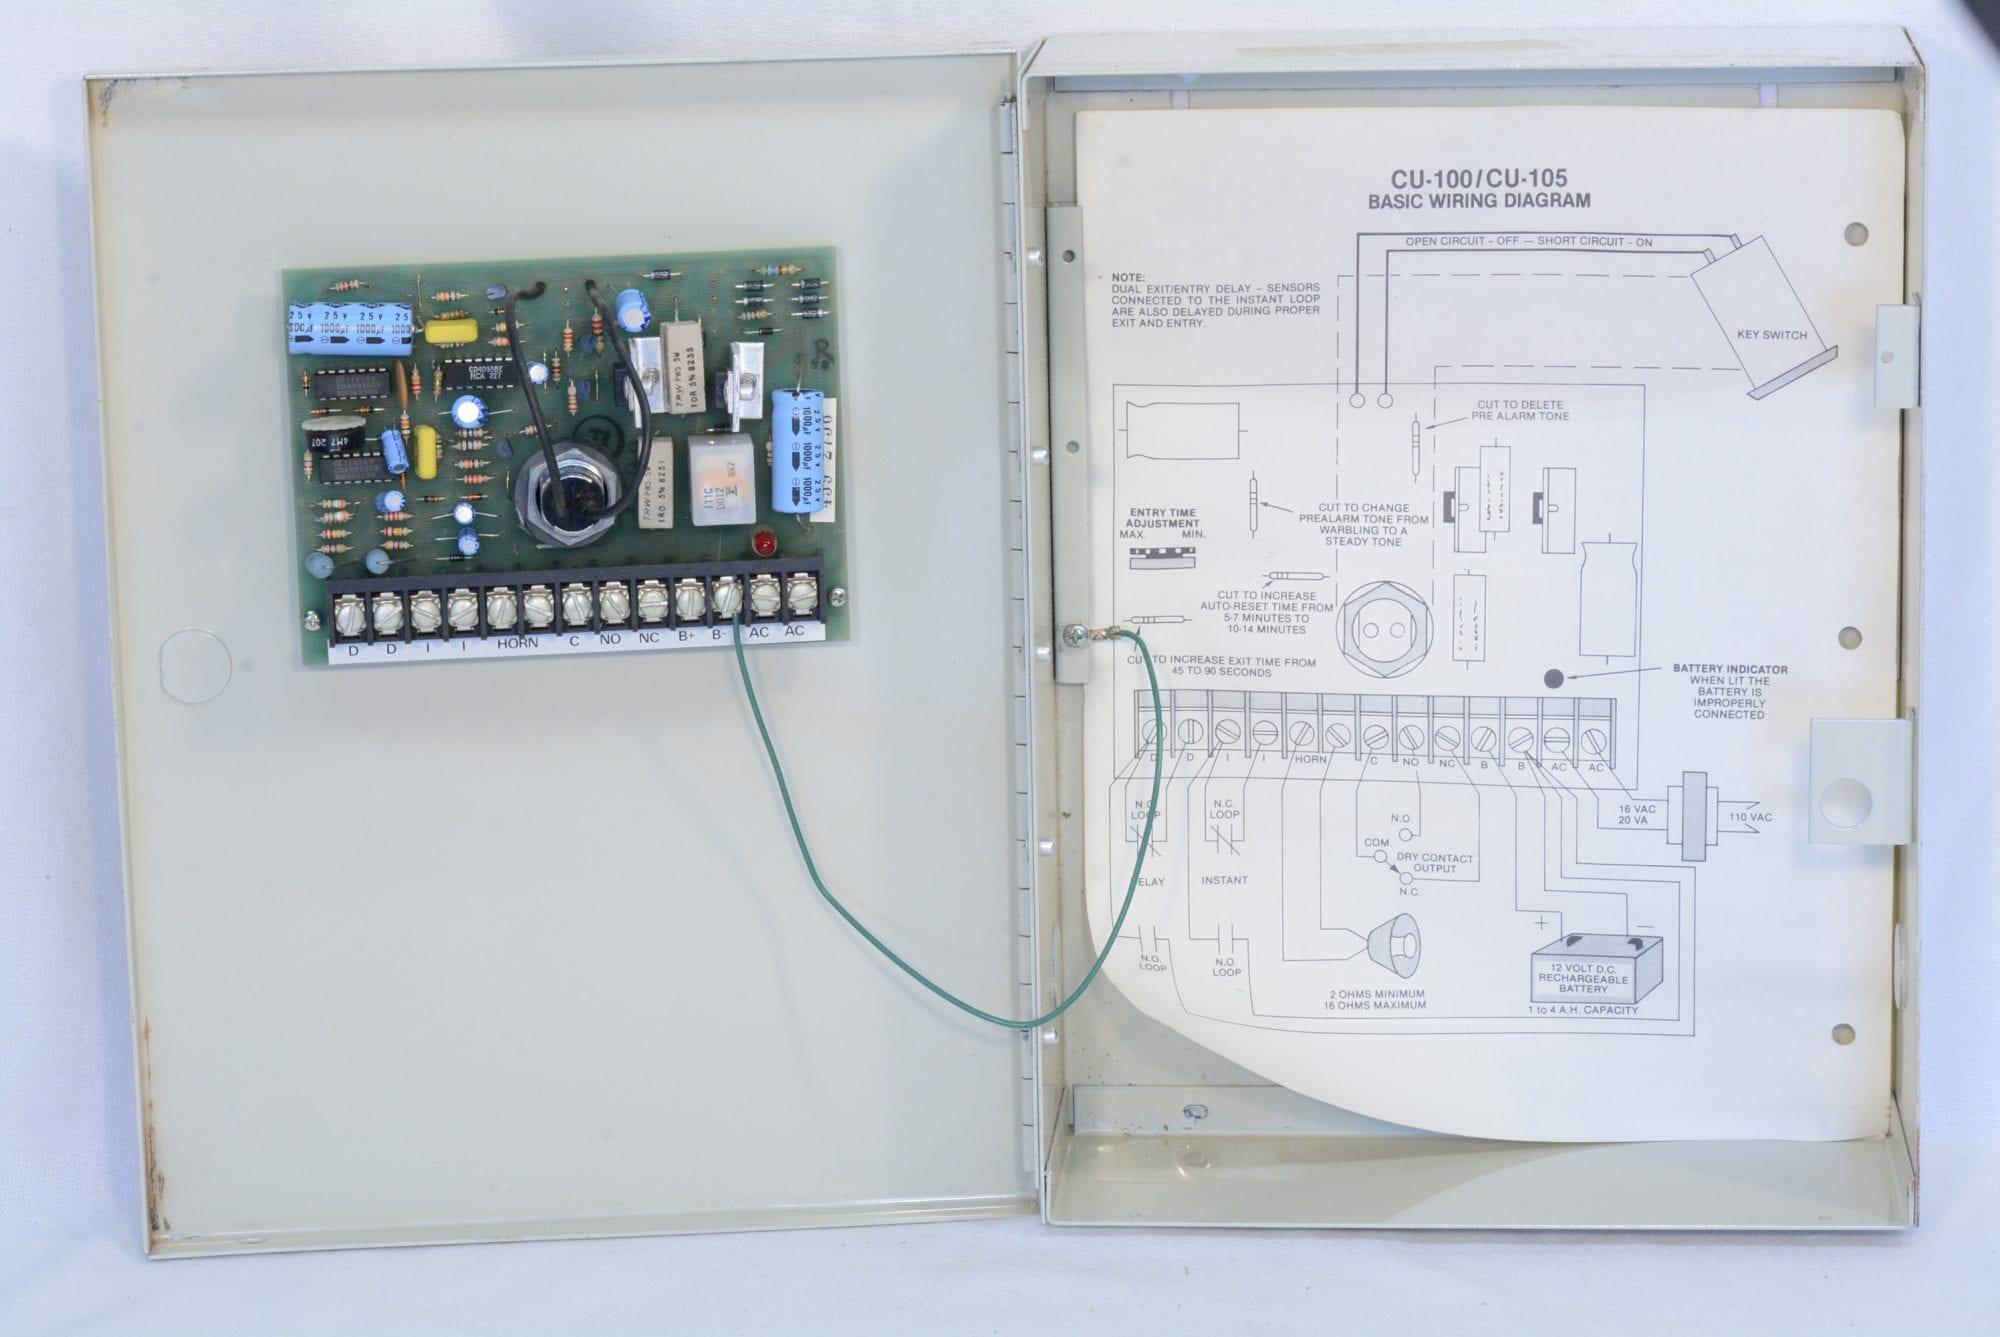 Modern Rj31x Wiring Diagram To Alarm System Photos - Wiring Diagram ...